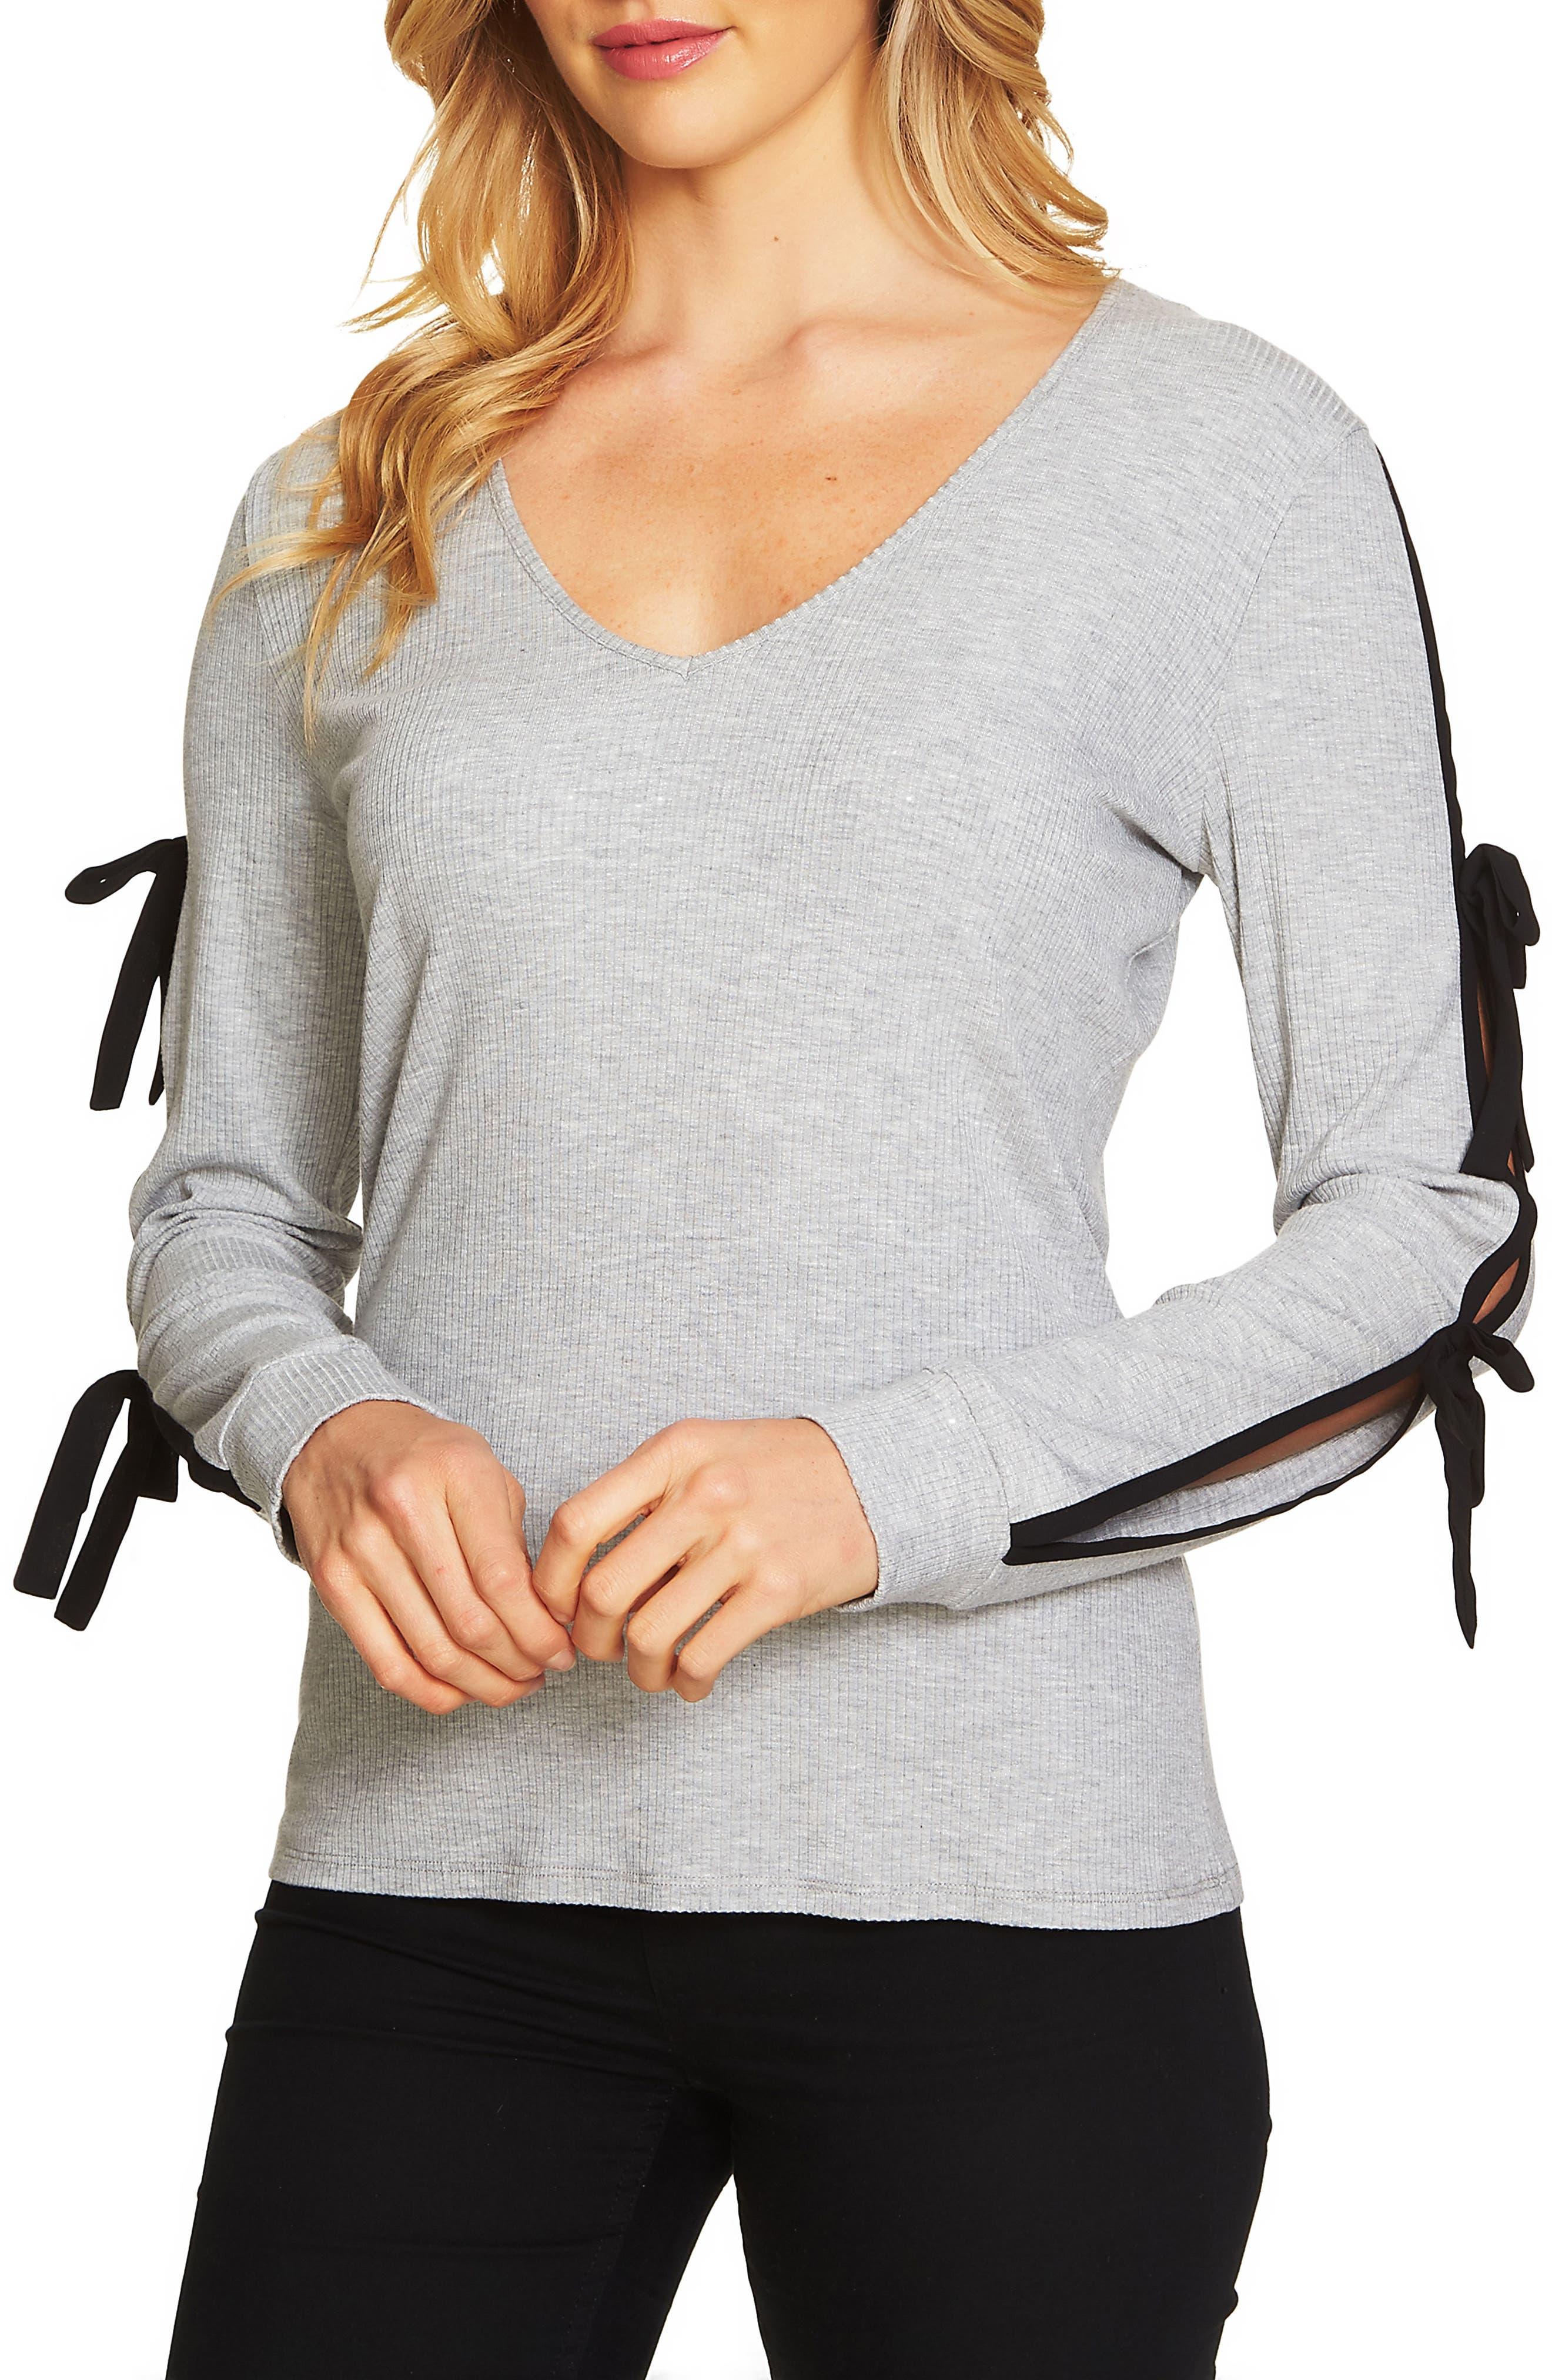 Main Image - Cece V-Neck Ribbed Knit Top